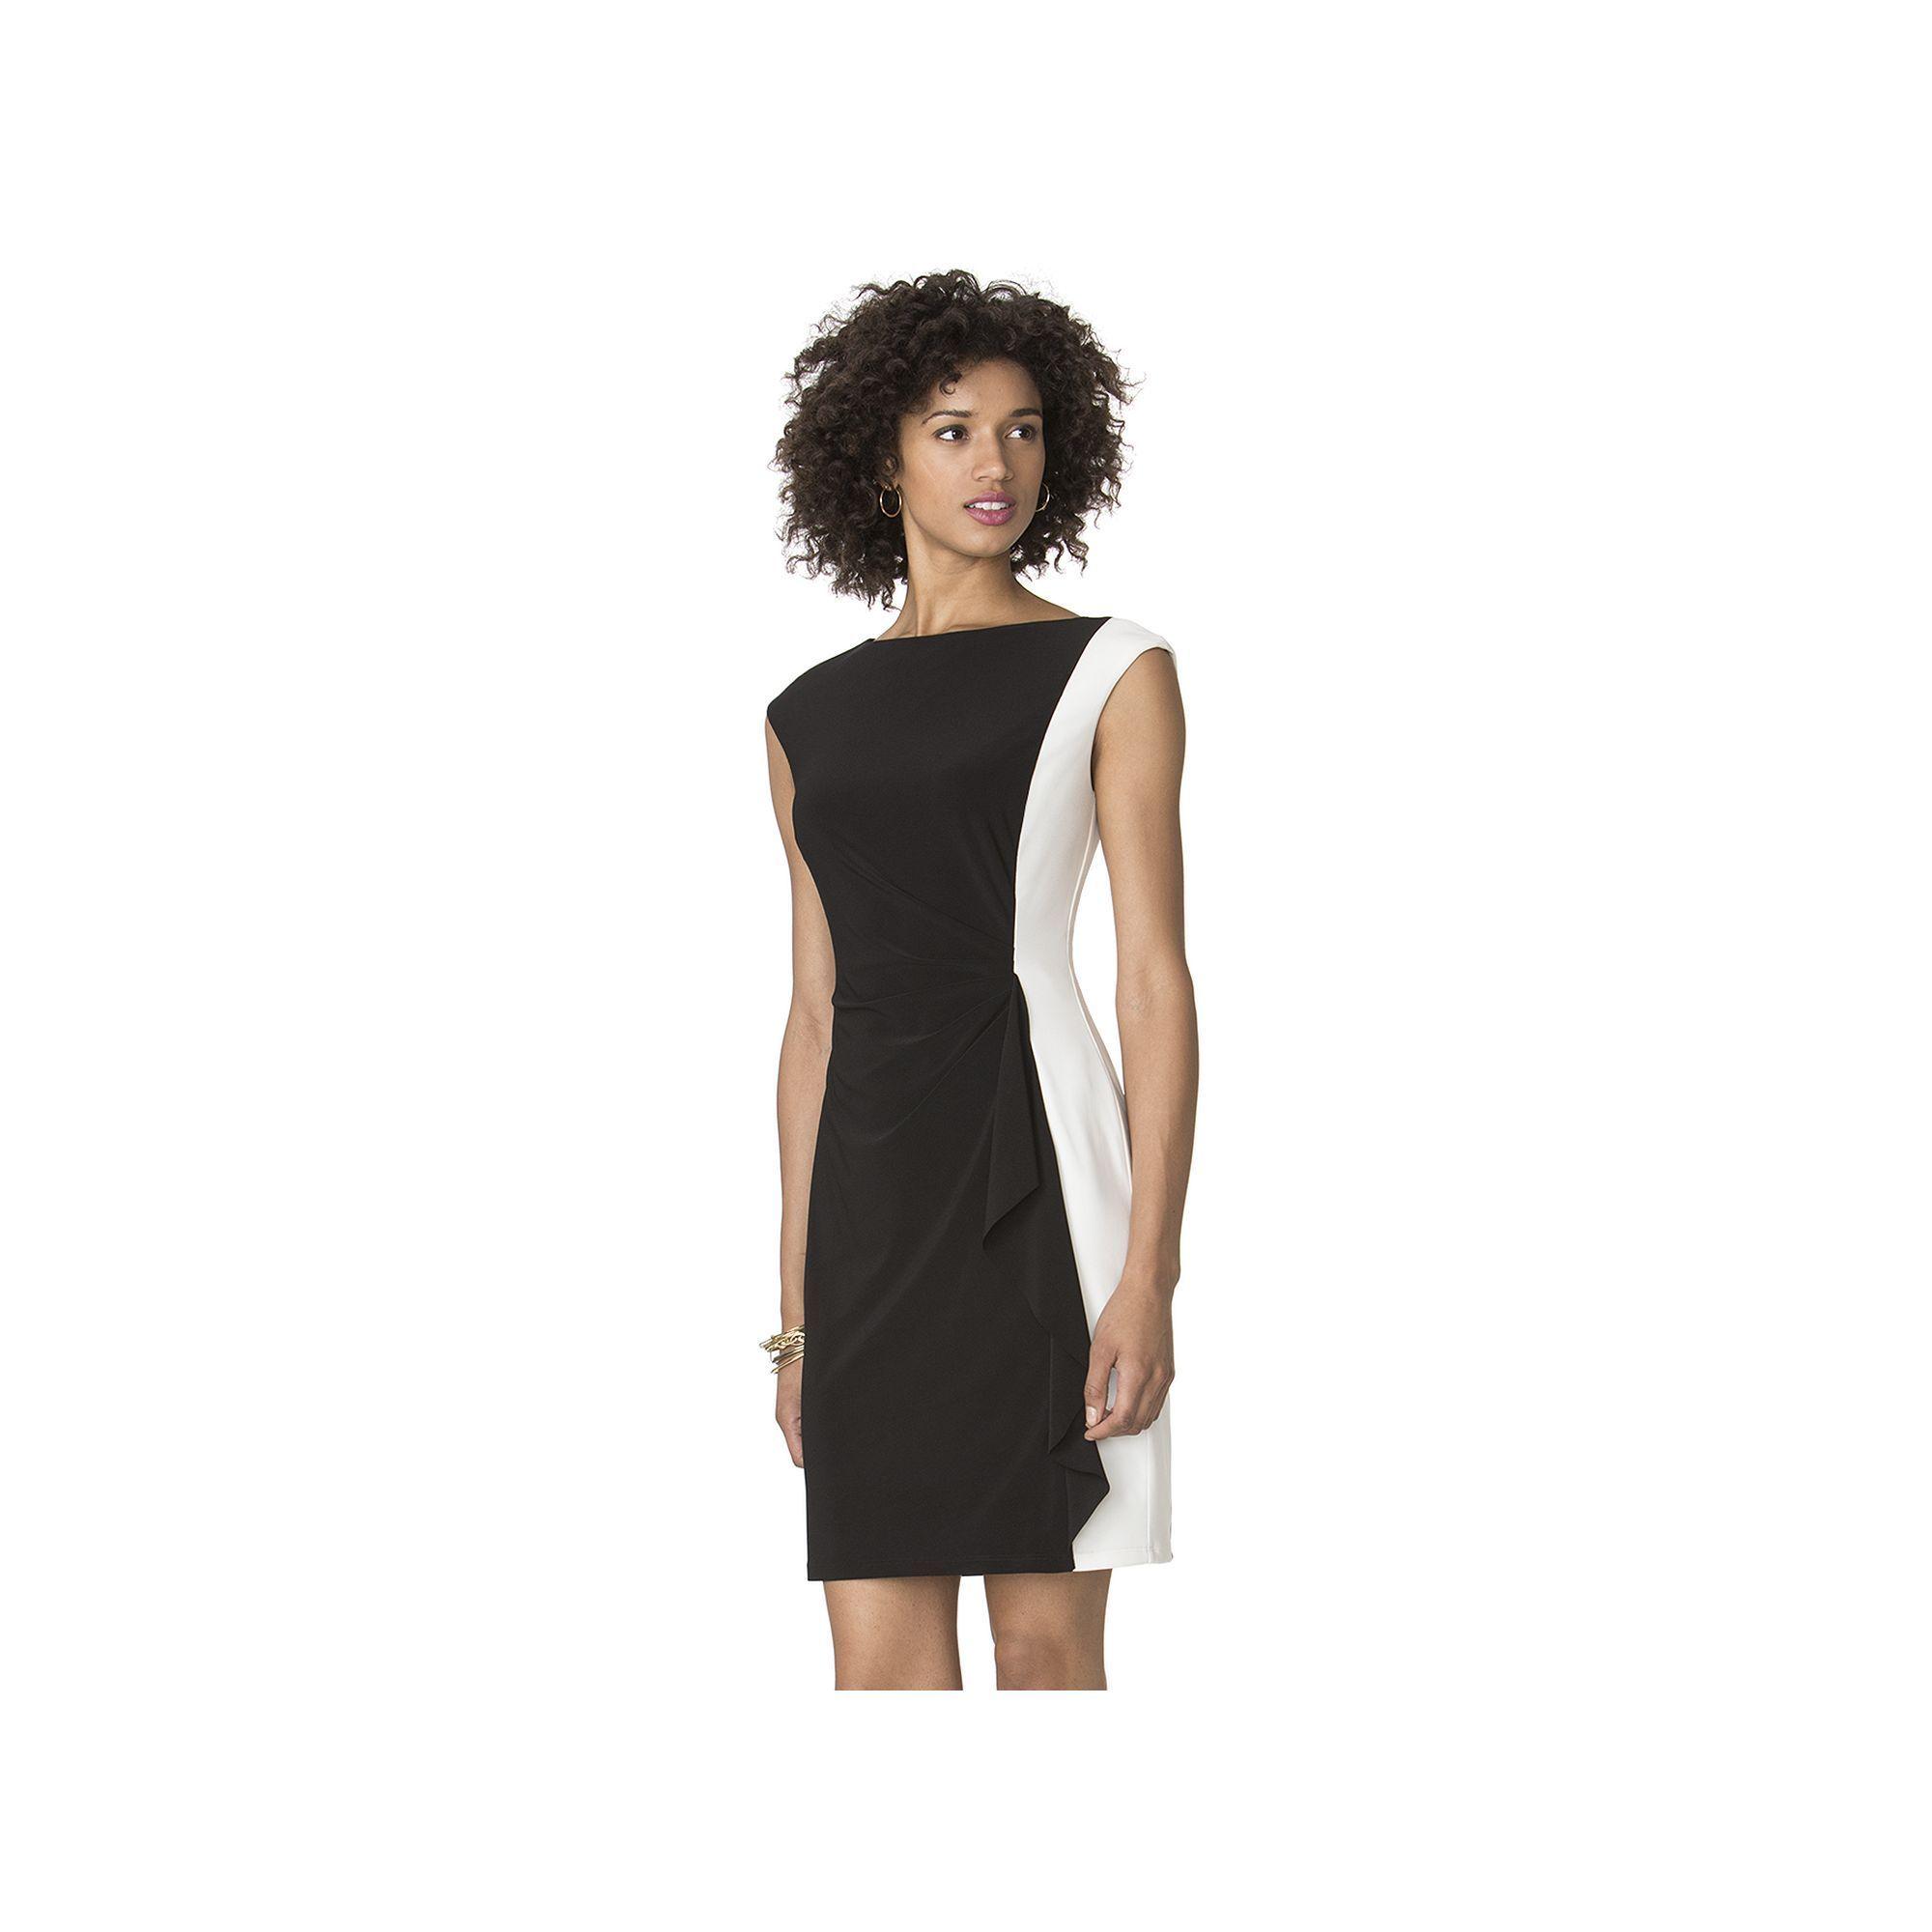 787c7ba900 Petite Chaps Colorblock Sheath Dress